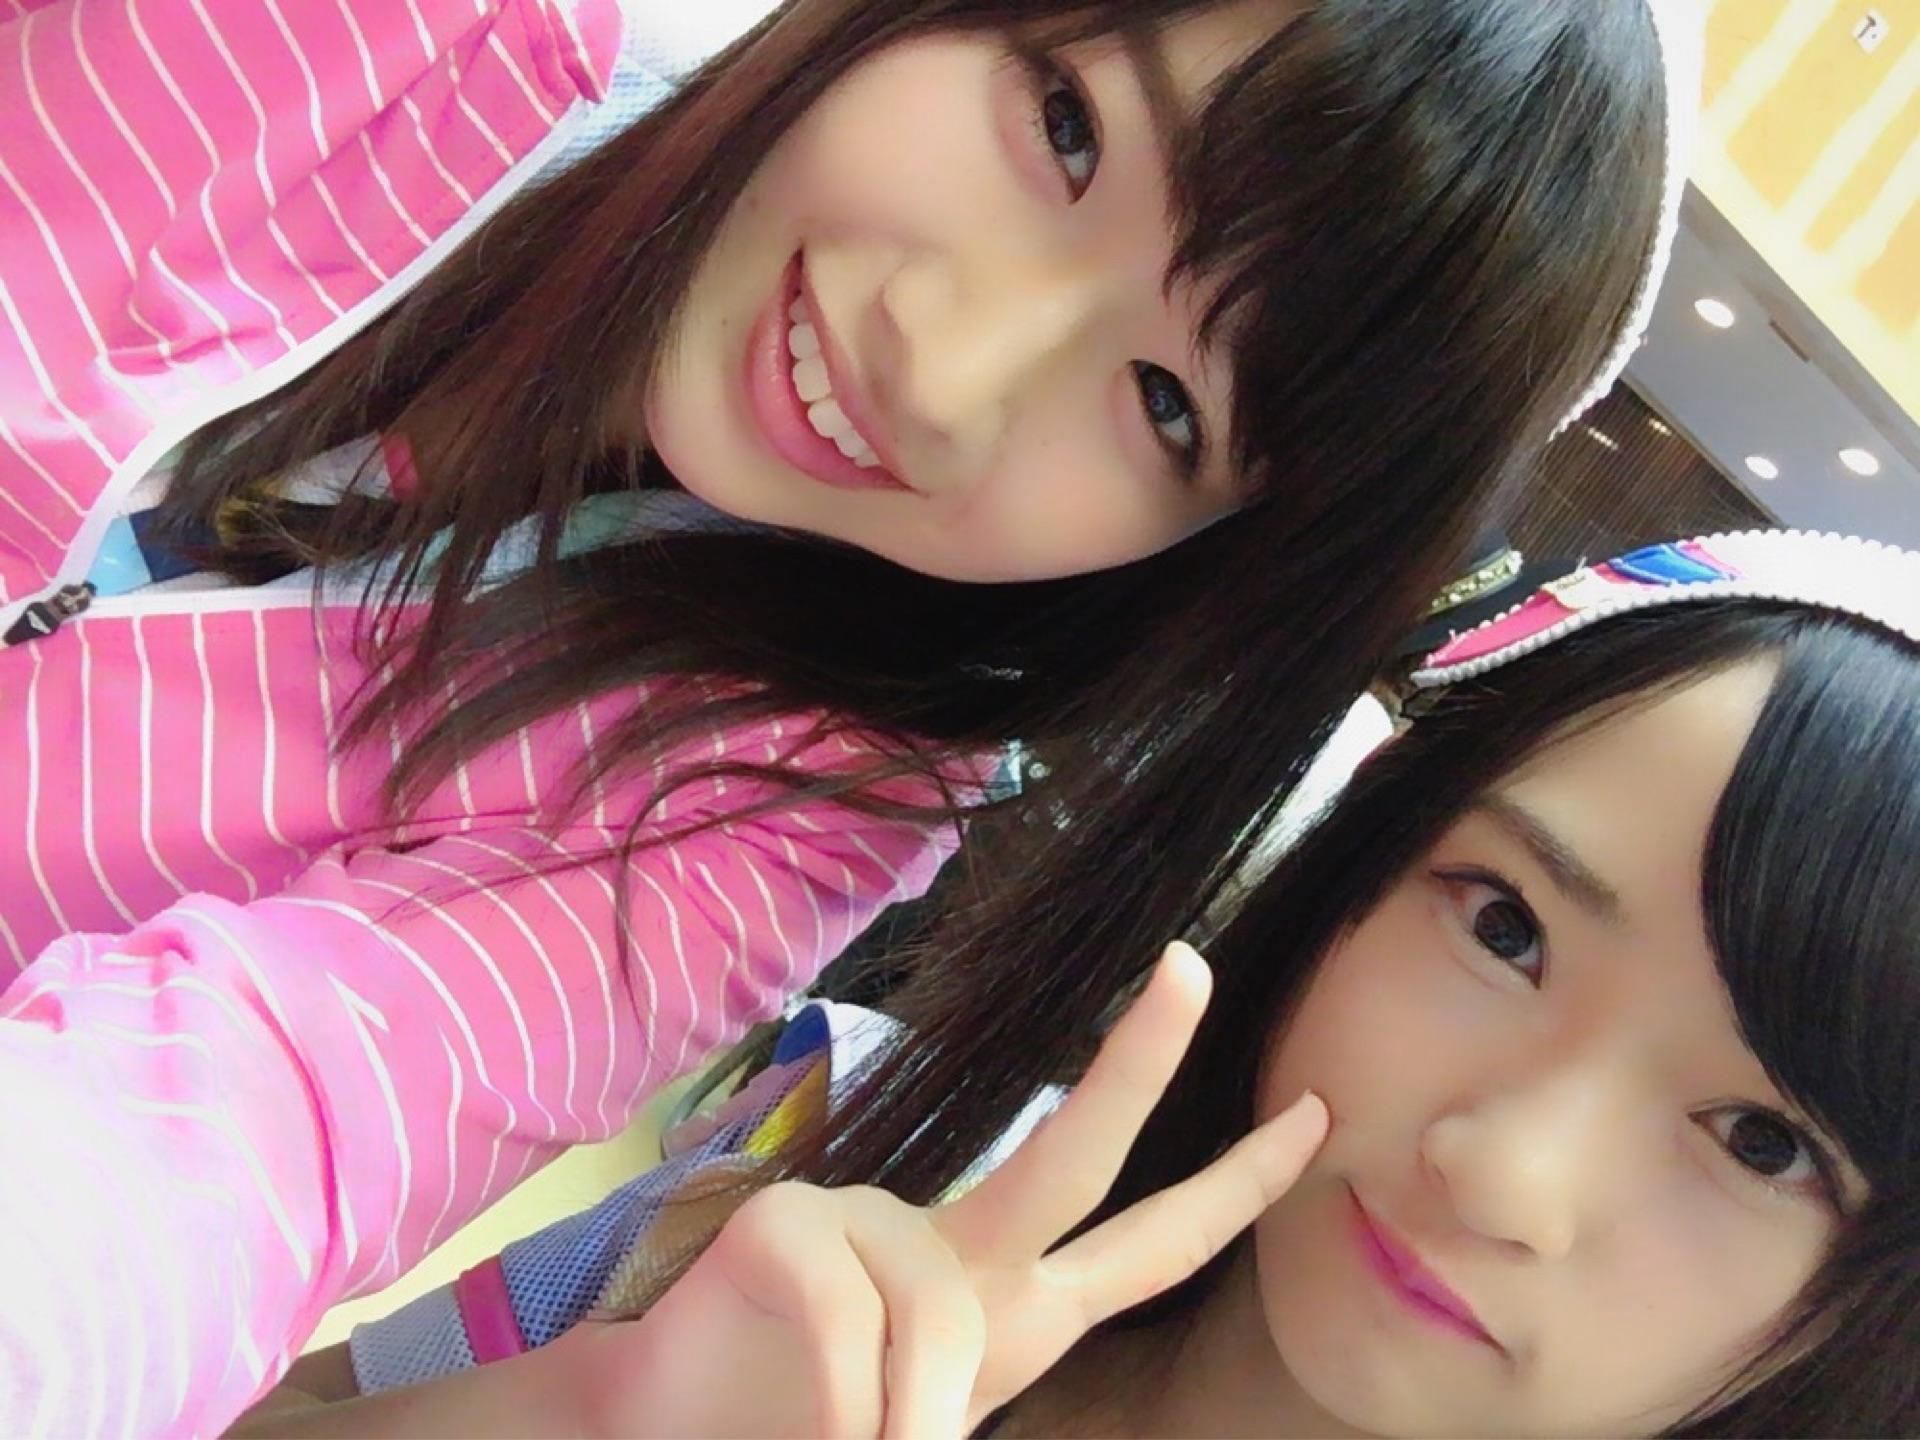 【AKB48チーム8】歌田初夏応援スレ★2【愛知県代表】©2ch.netYouTube動画>1本 ->画像>227枚